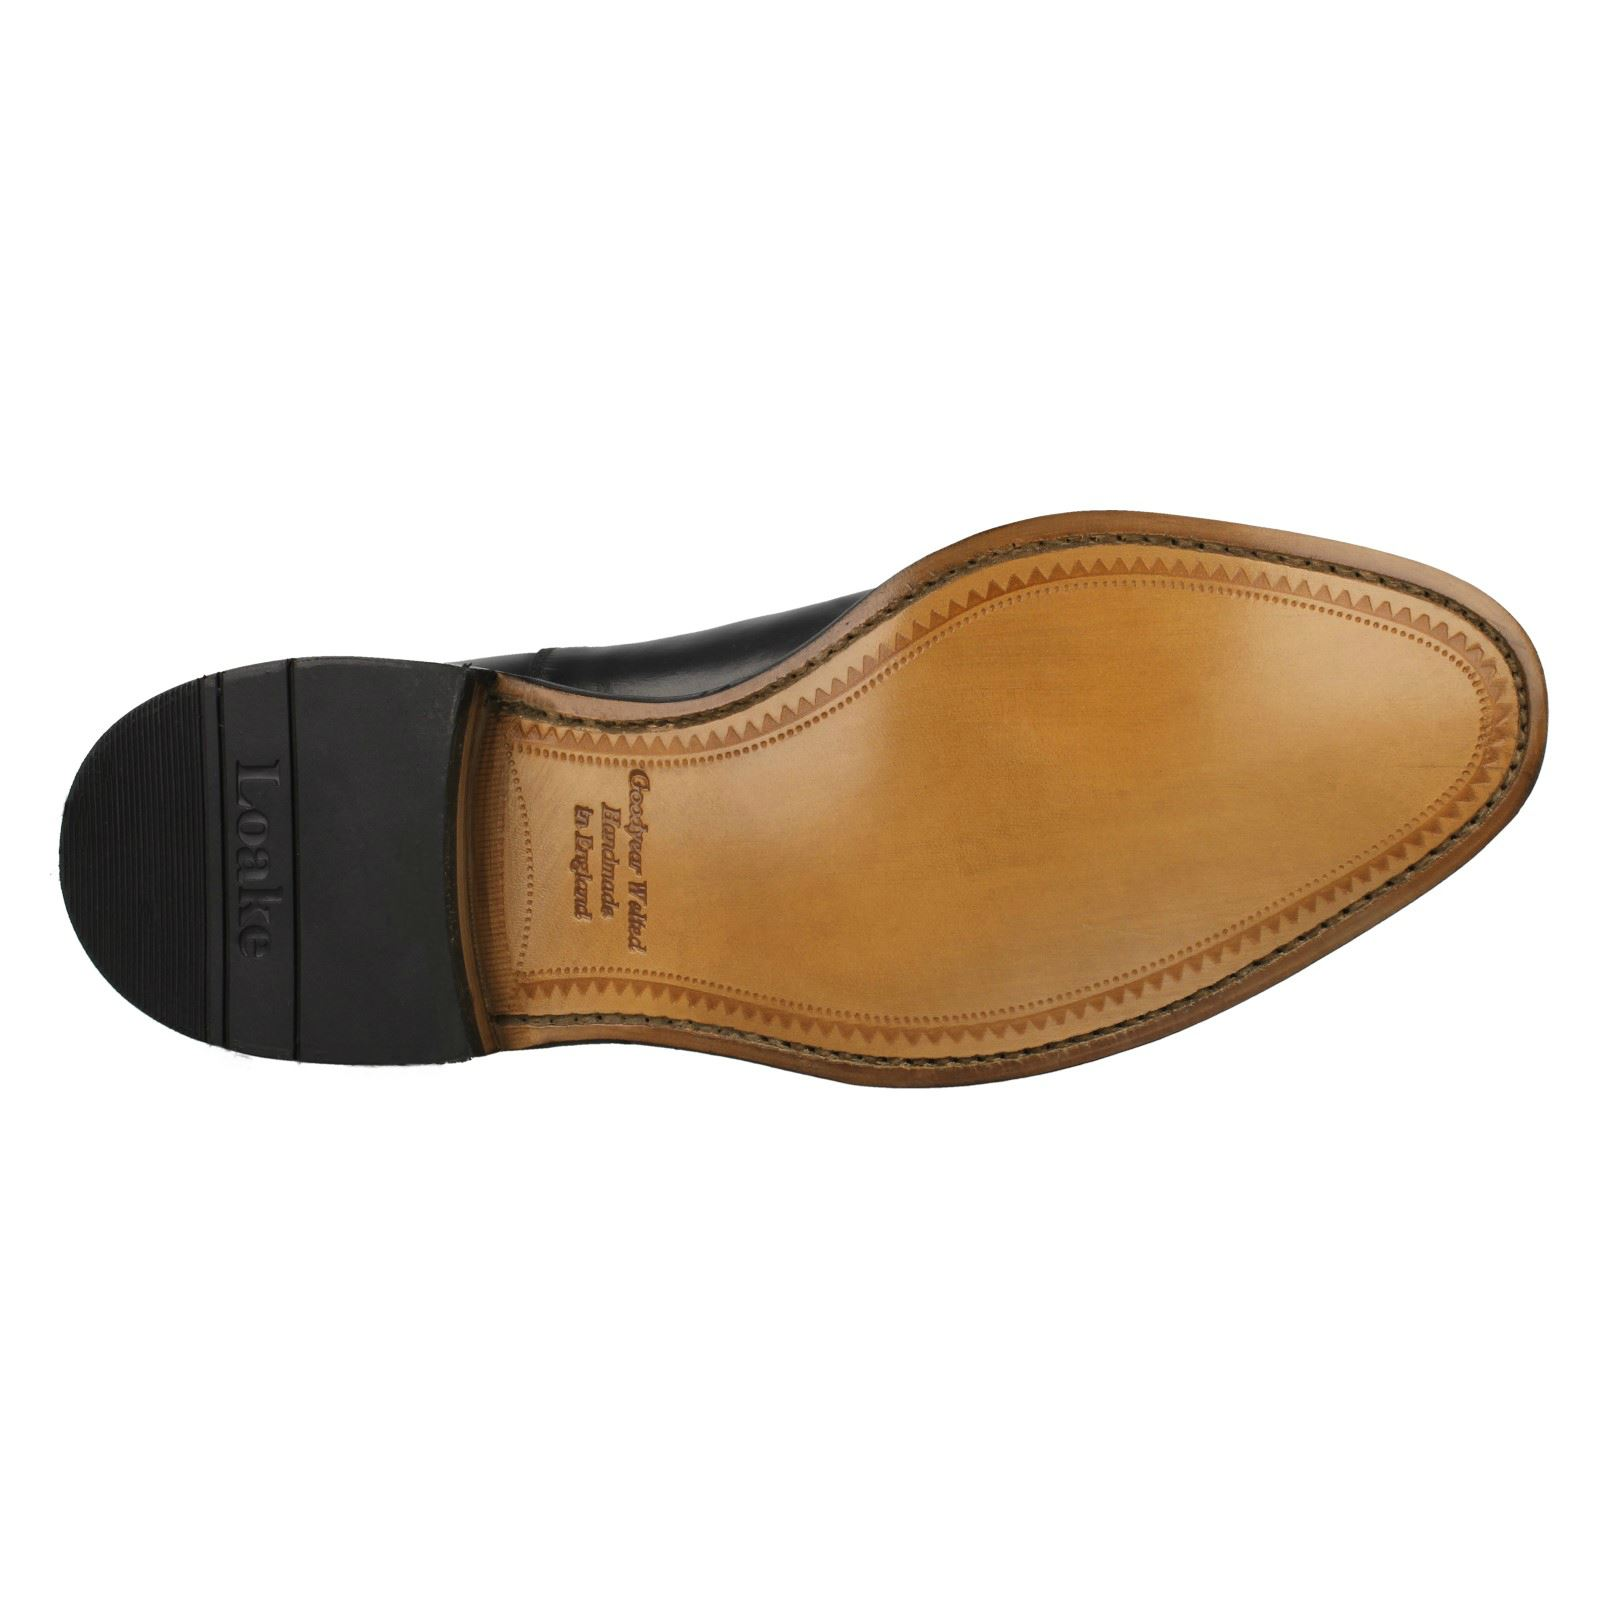 Mens Loake Loake Loake Formal Chelsea Boots 290B 4162ec